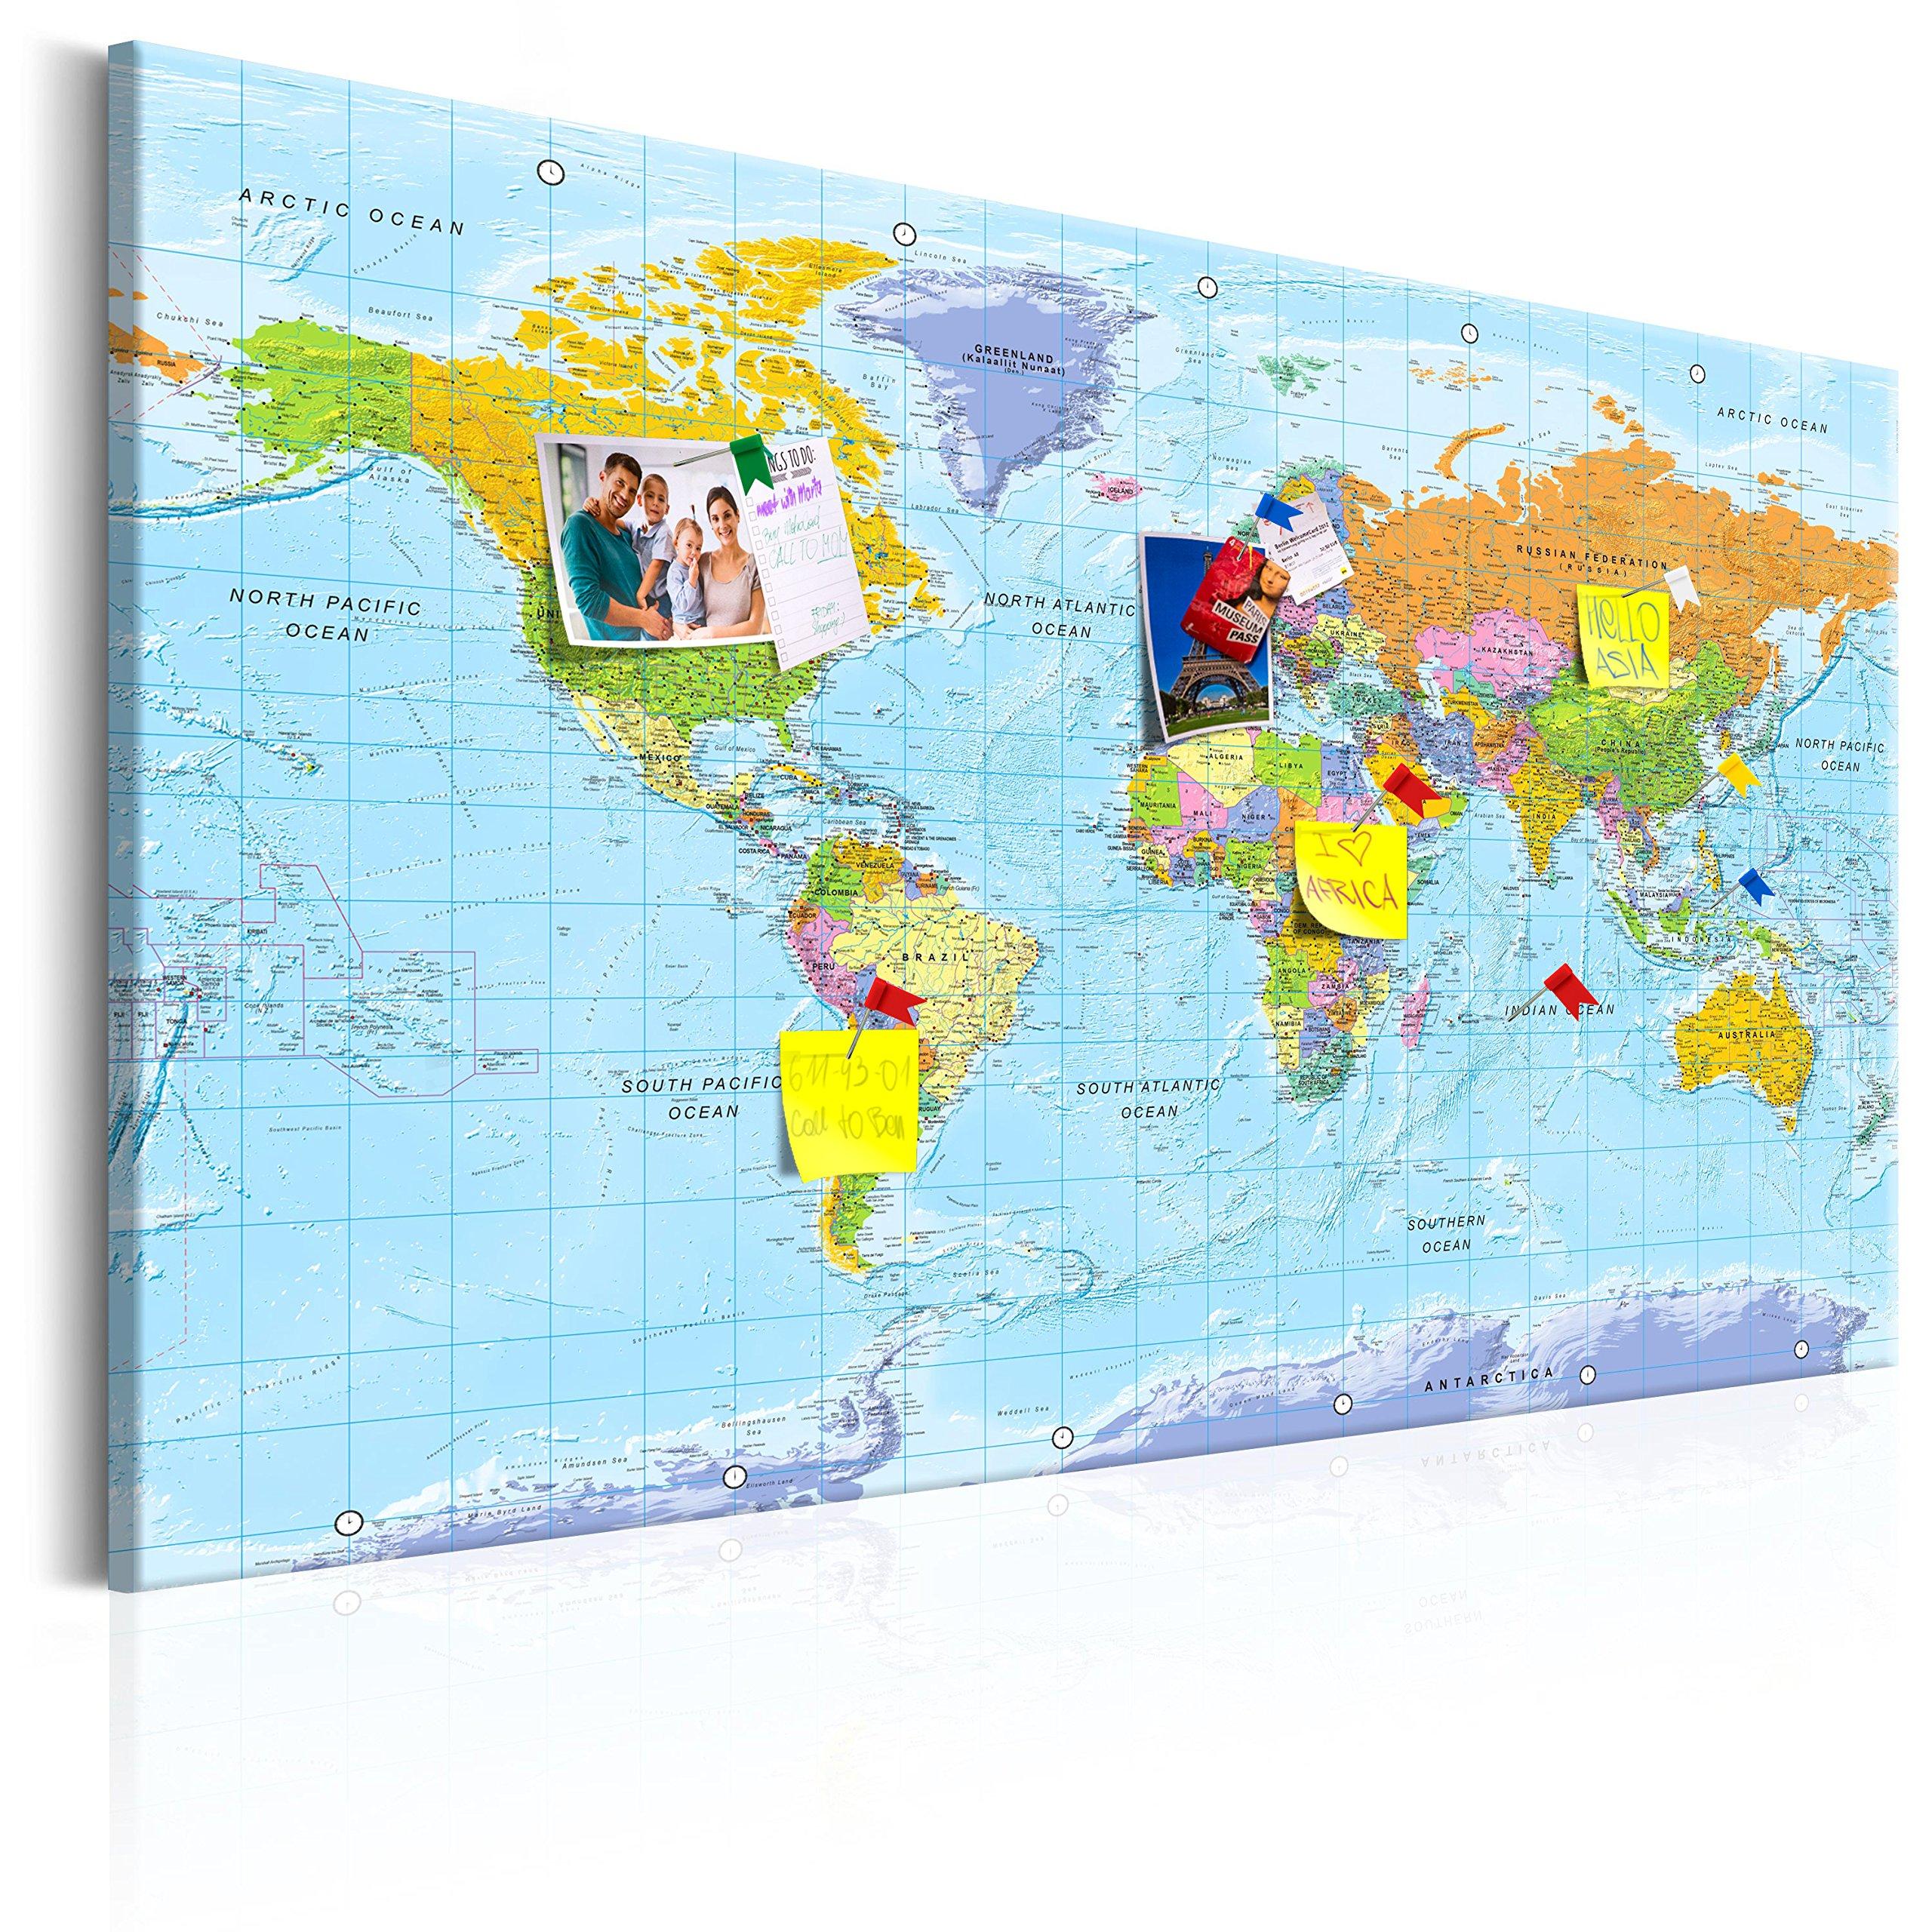 murando - Mapamundi con Tablero para Clavar chinchetas 120x80 cm - Cuadro en Lienzo sintético - 1 Parte - Panel de Fibra - Mapa del Mundo Continente - k-A-0094-v-a: Amazon.es: Hogar